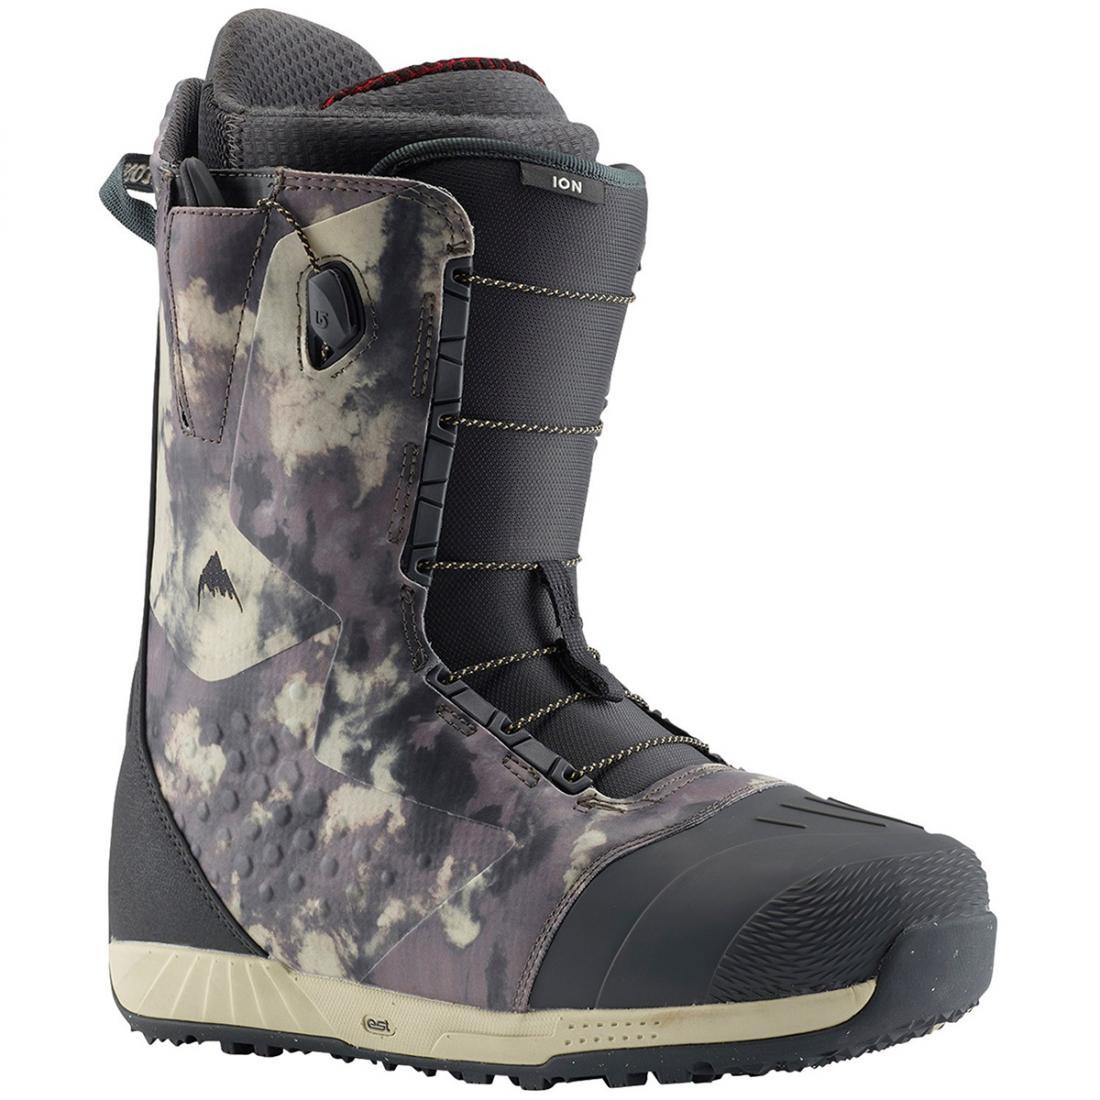 4fd5095abb3a Ботинки для сноуборда Burton ION купить в интернет-магазине Boardshop №1